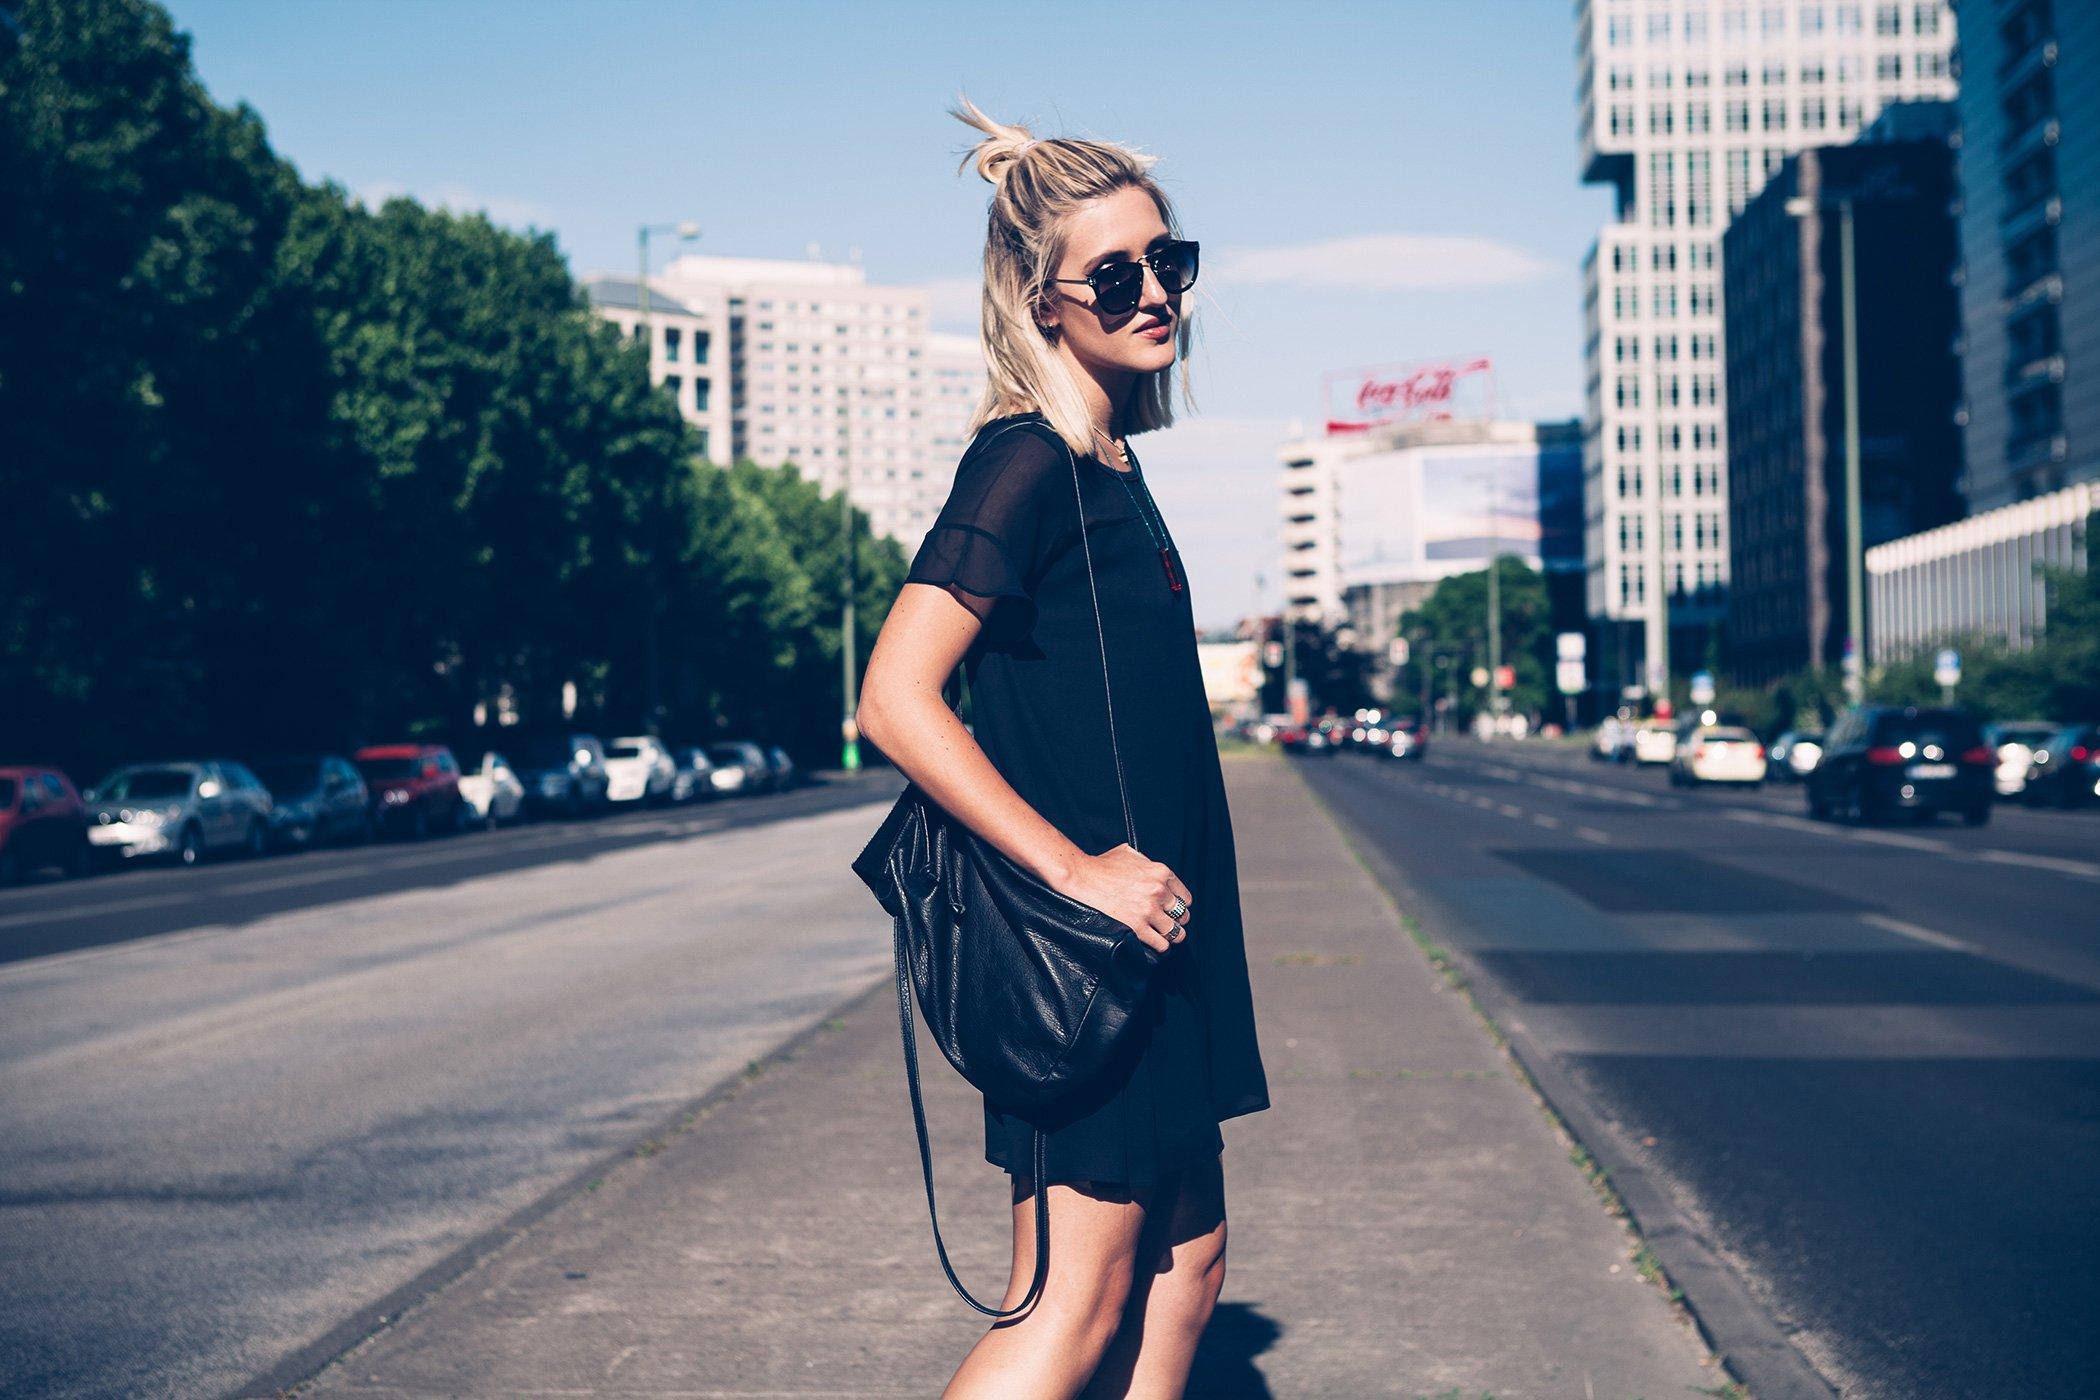 mikuta with a black dress